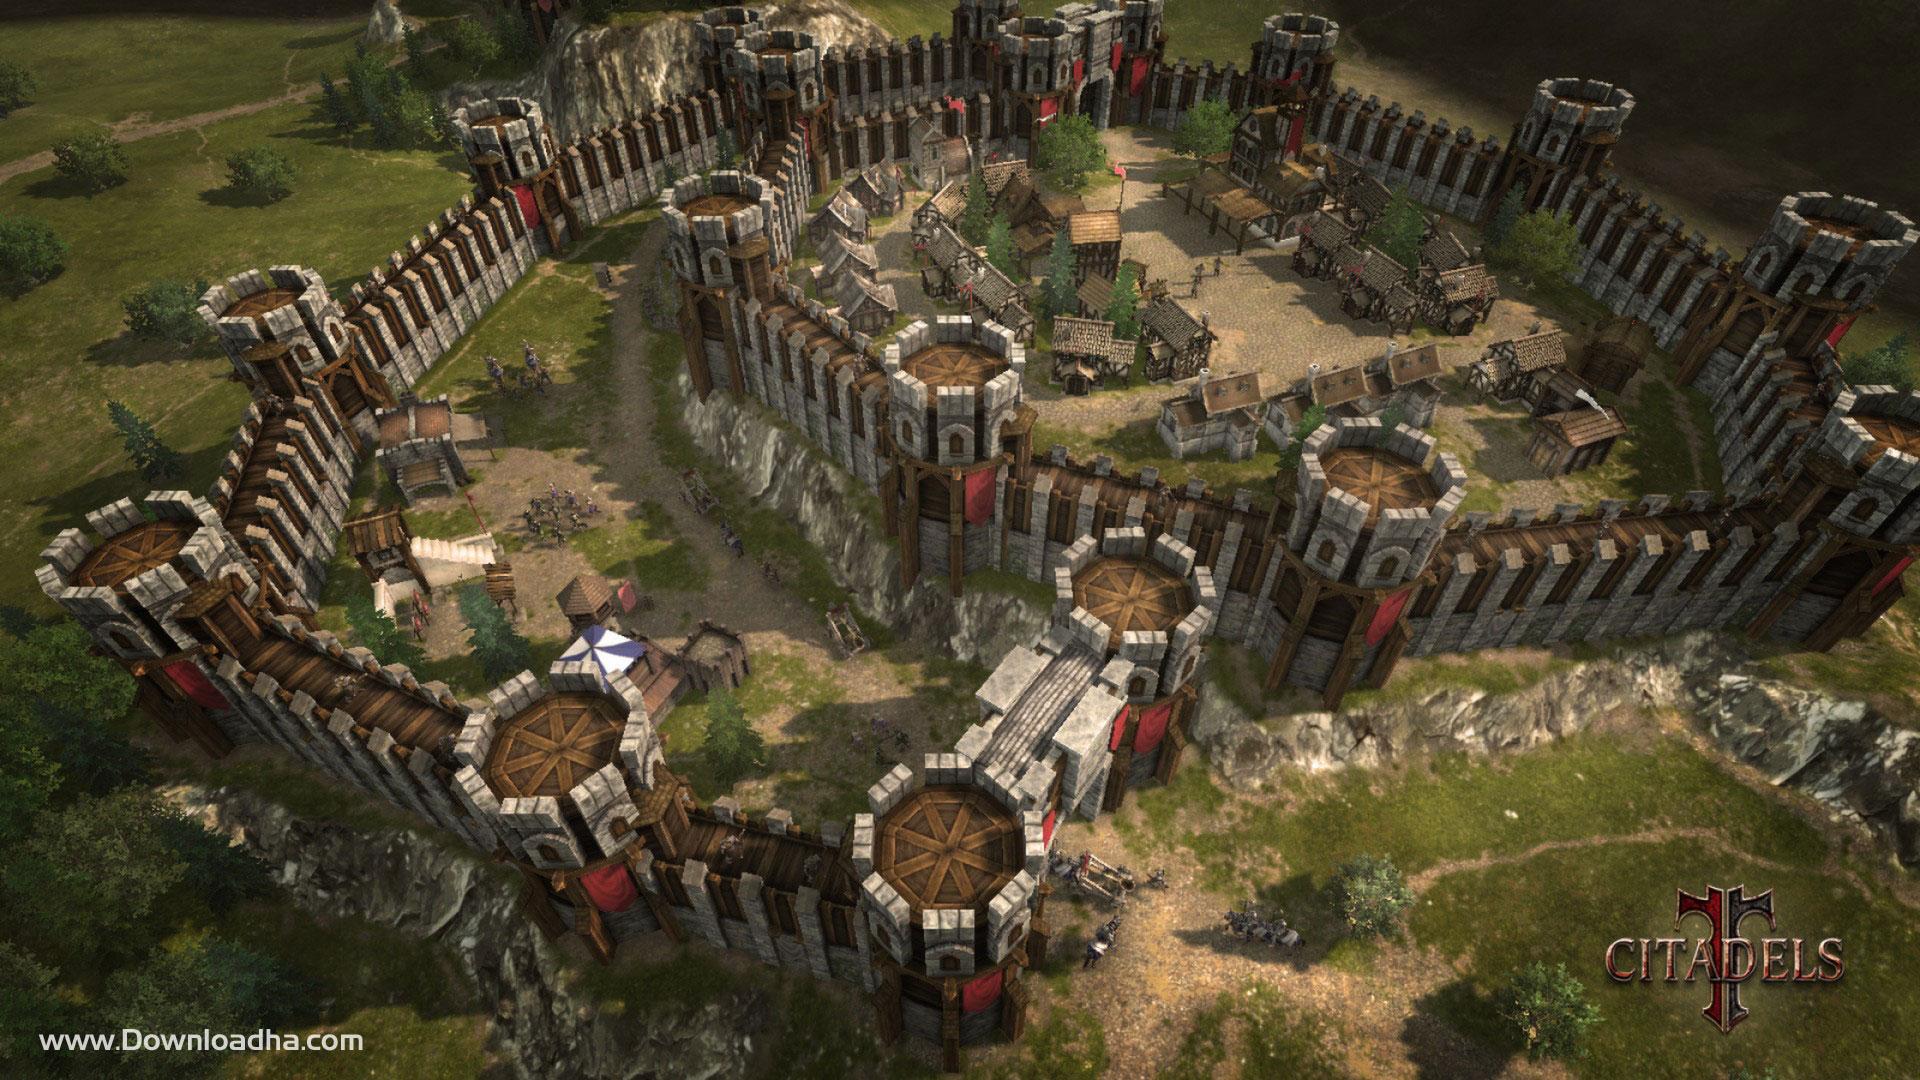 http://img5.downloadha.com/hosein/Game/July%202013/26/Citadels-screenshots-05-large.jpg